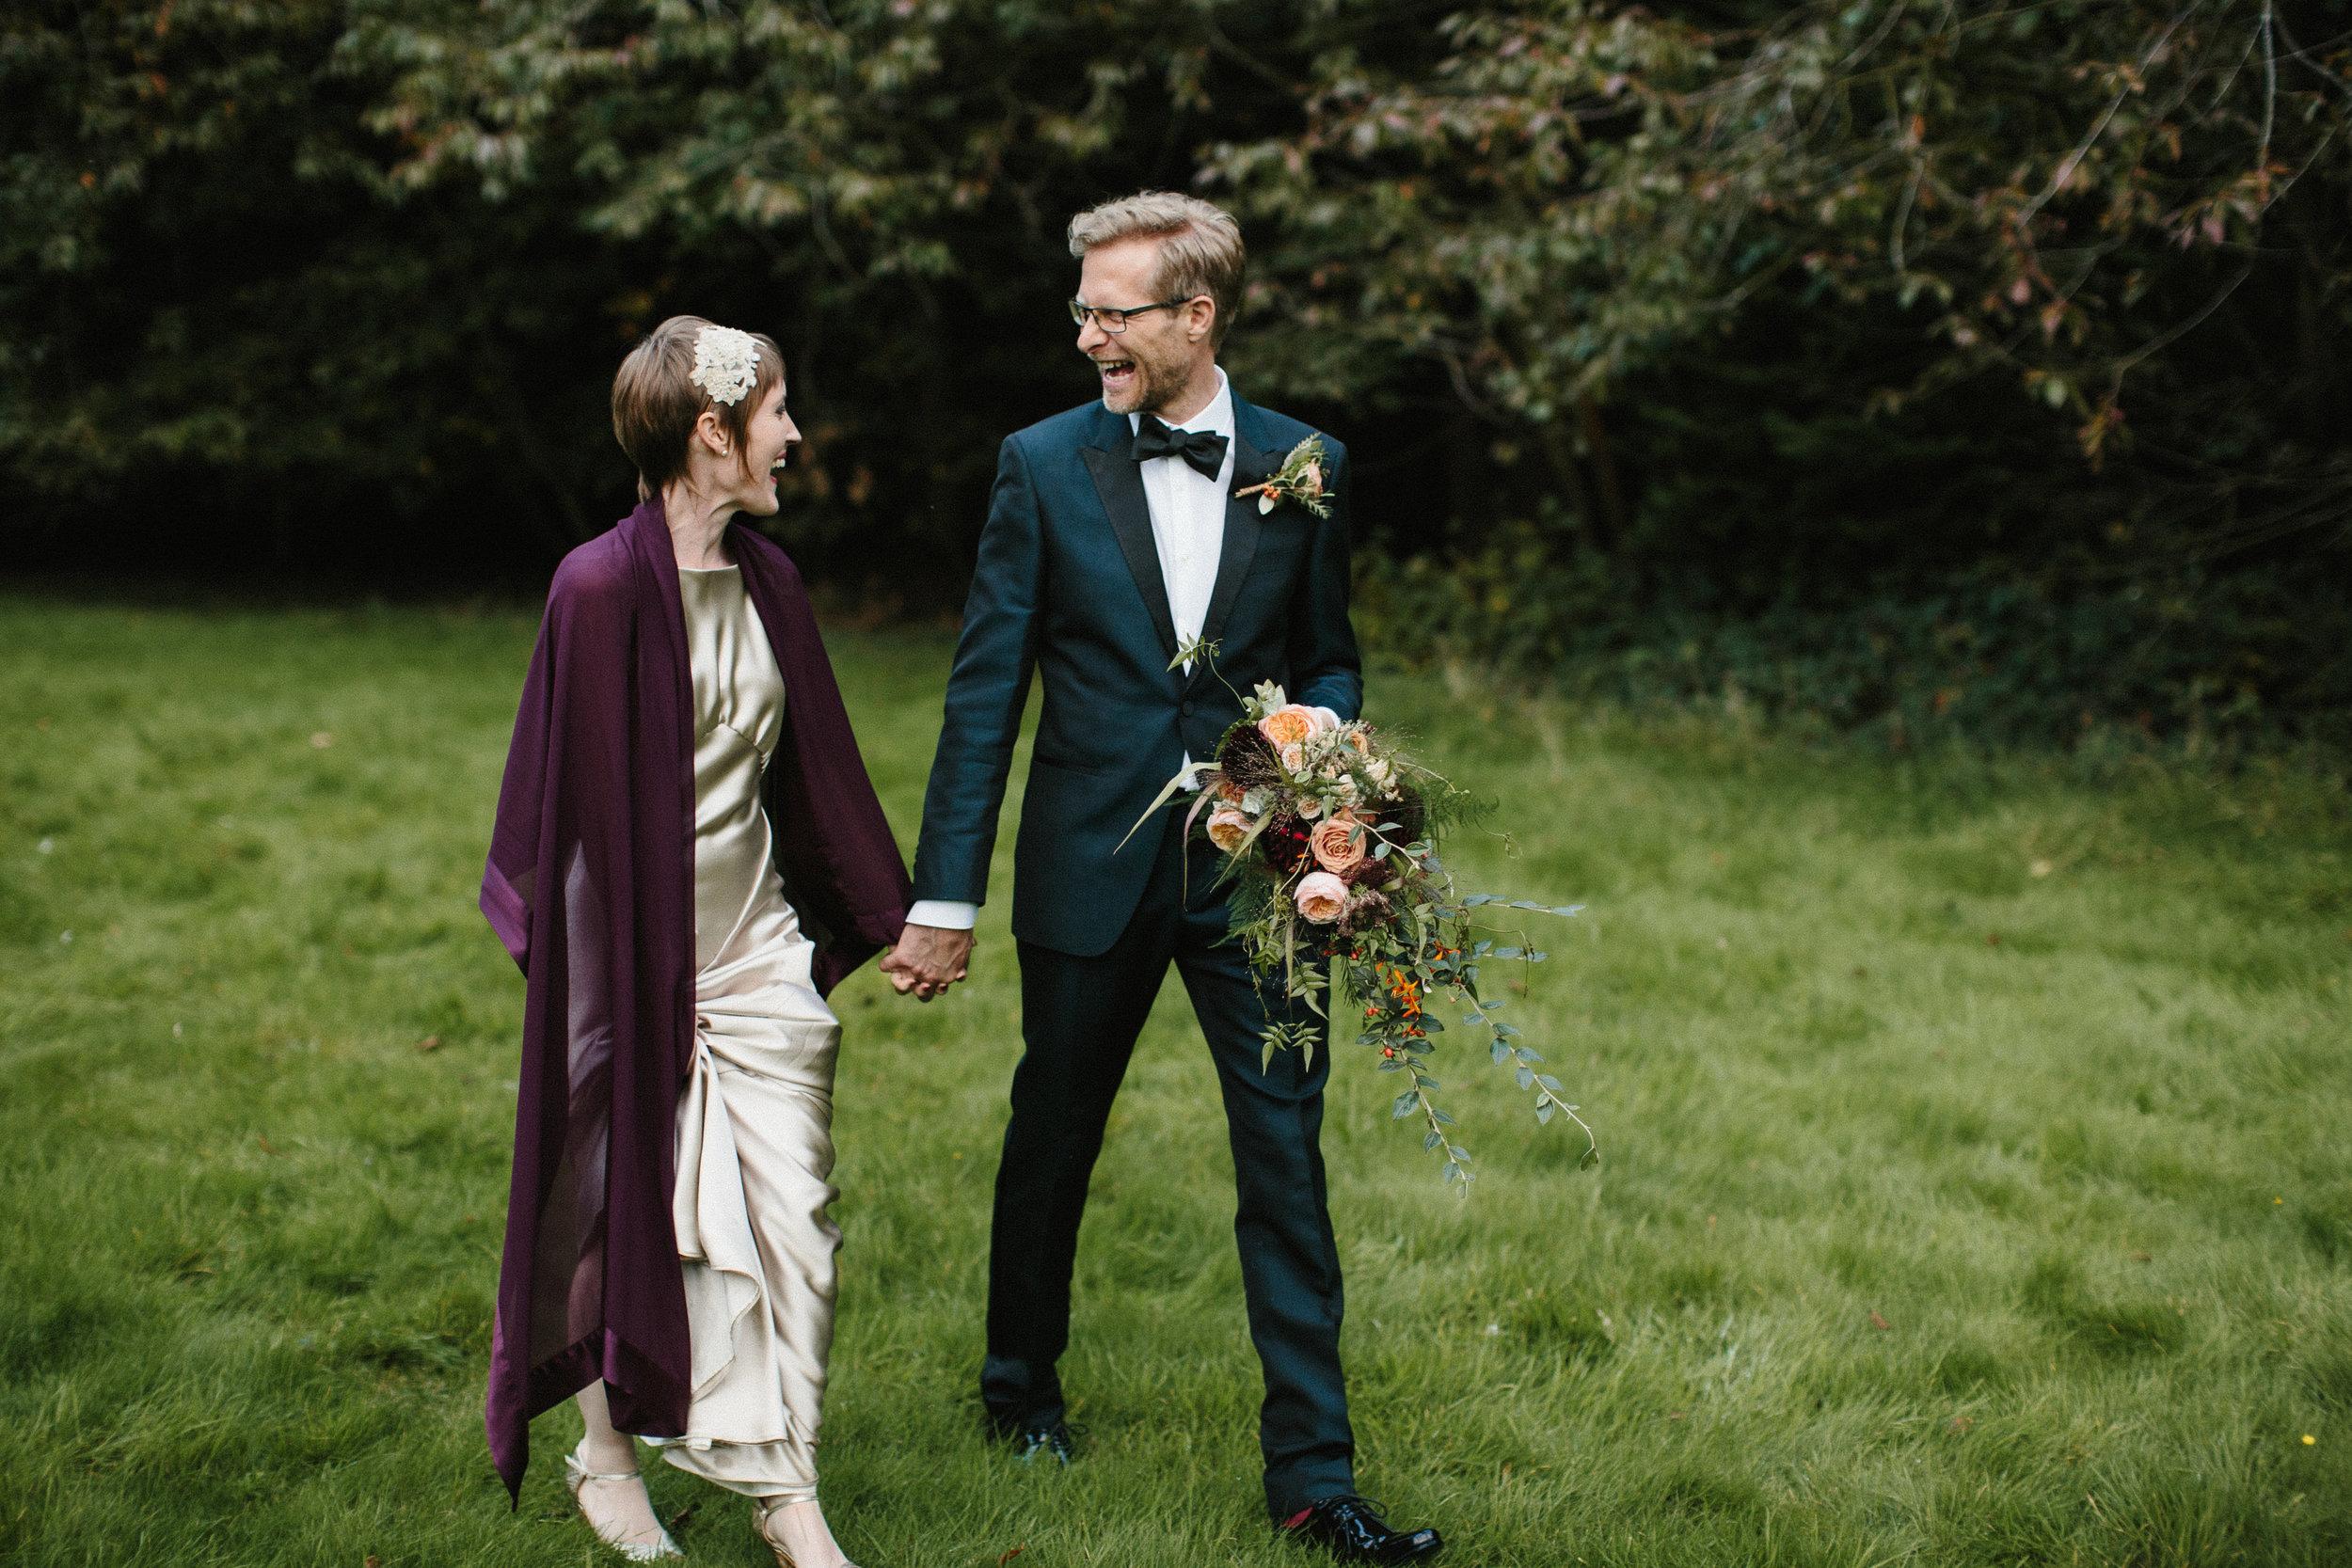 Kate-Beaumont-Sheffield-Honeysuckle-bias-cut-wedding-dress-oyster-Rosie39.jpg